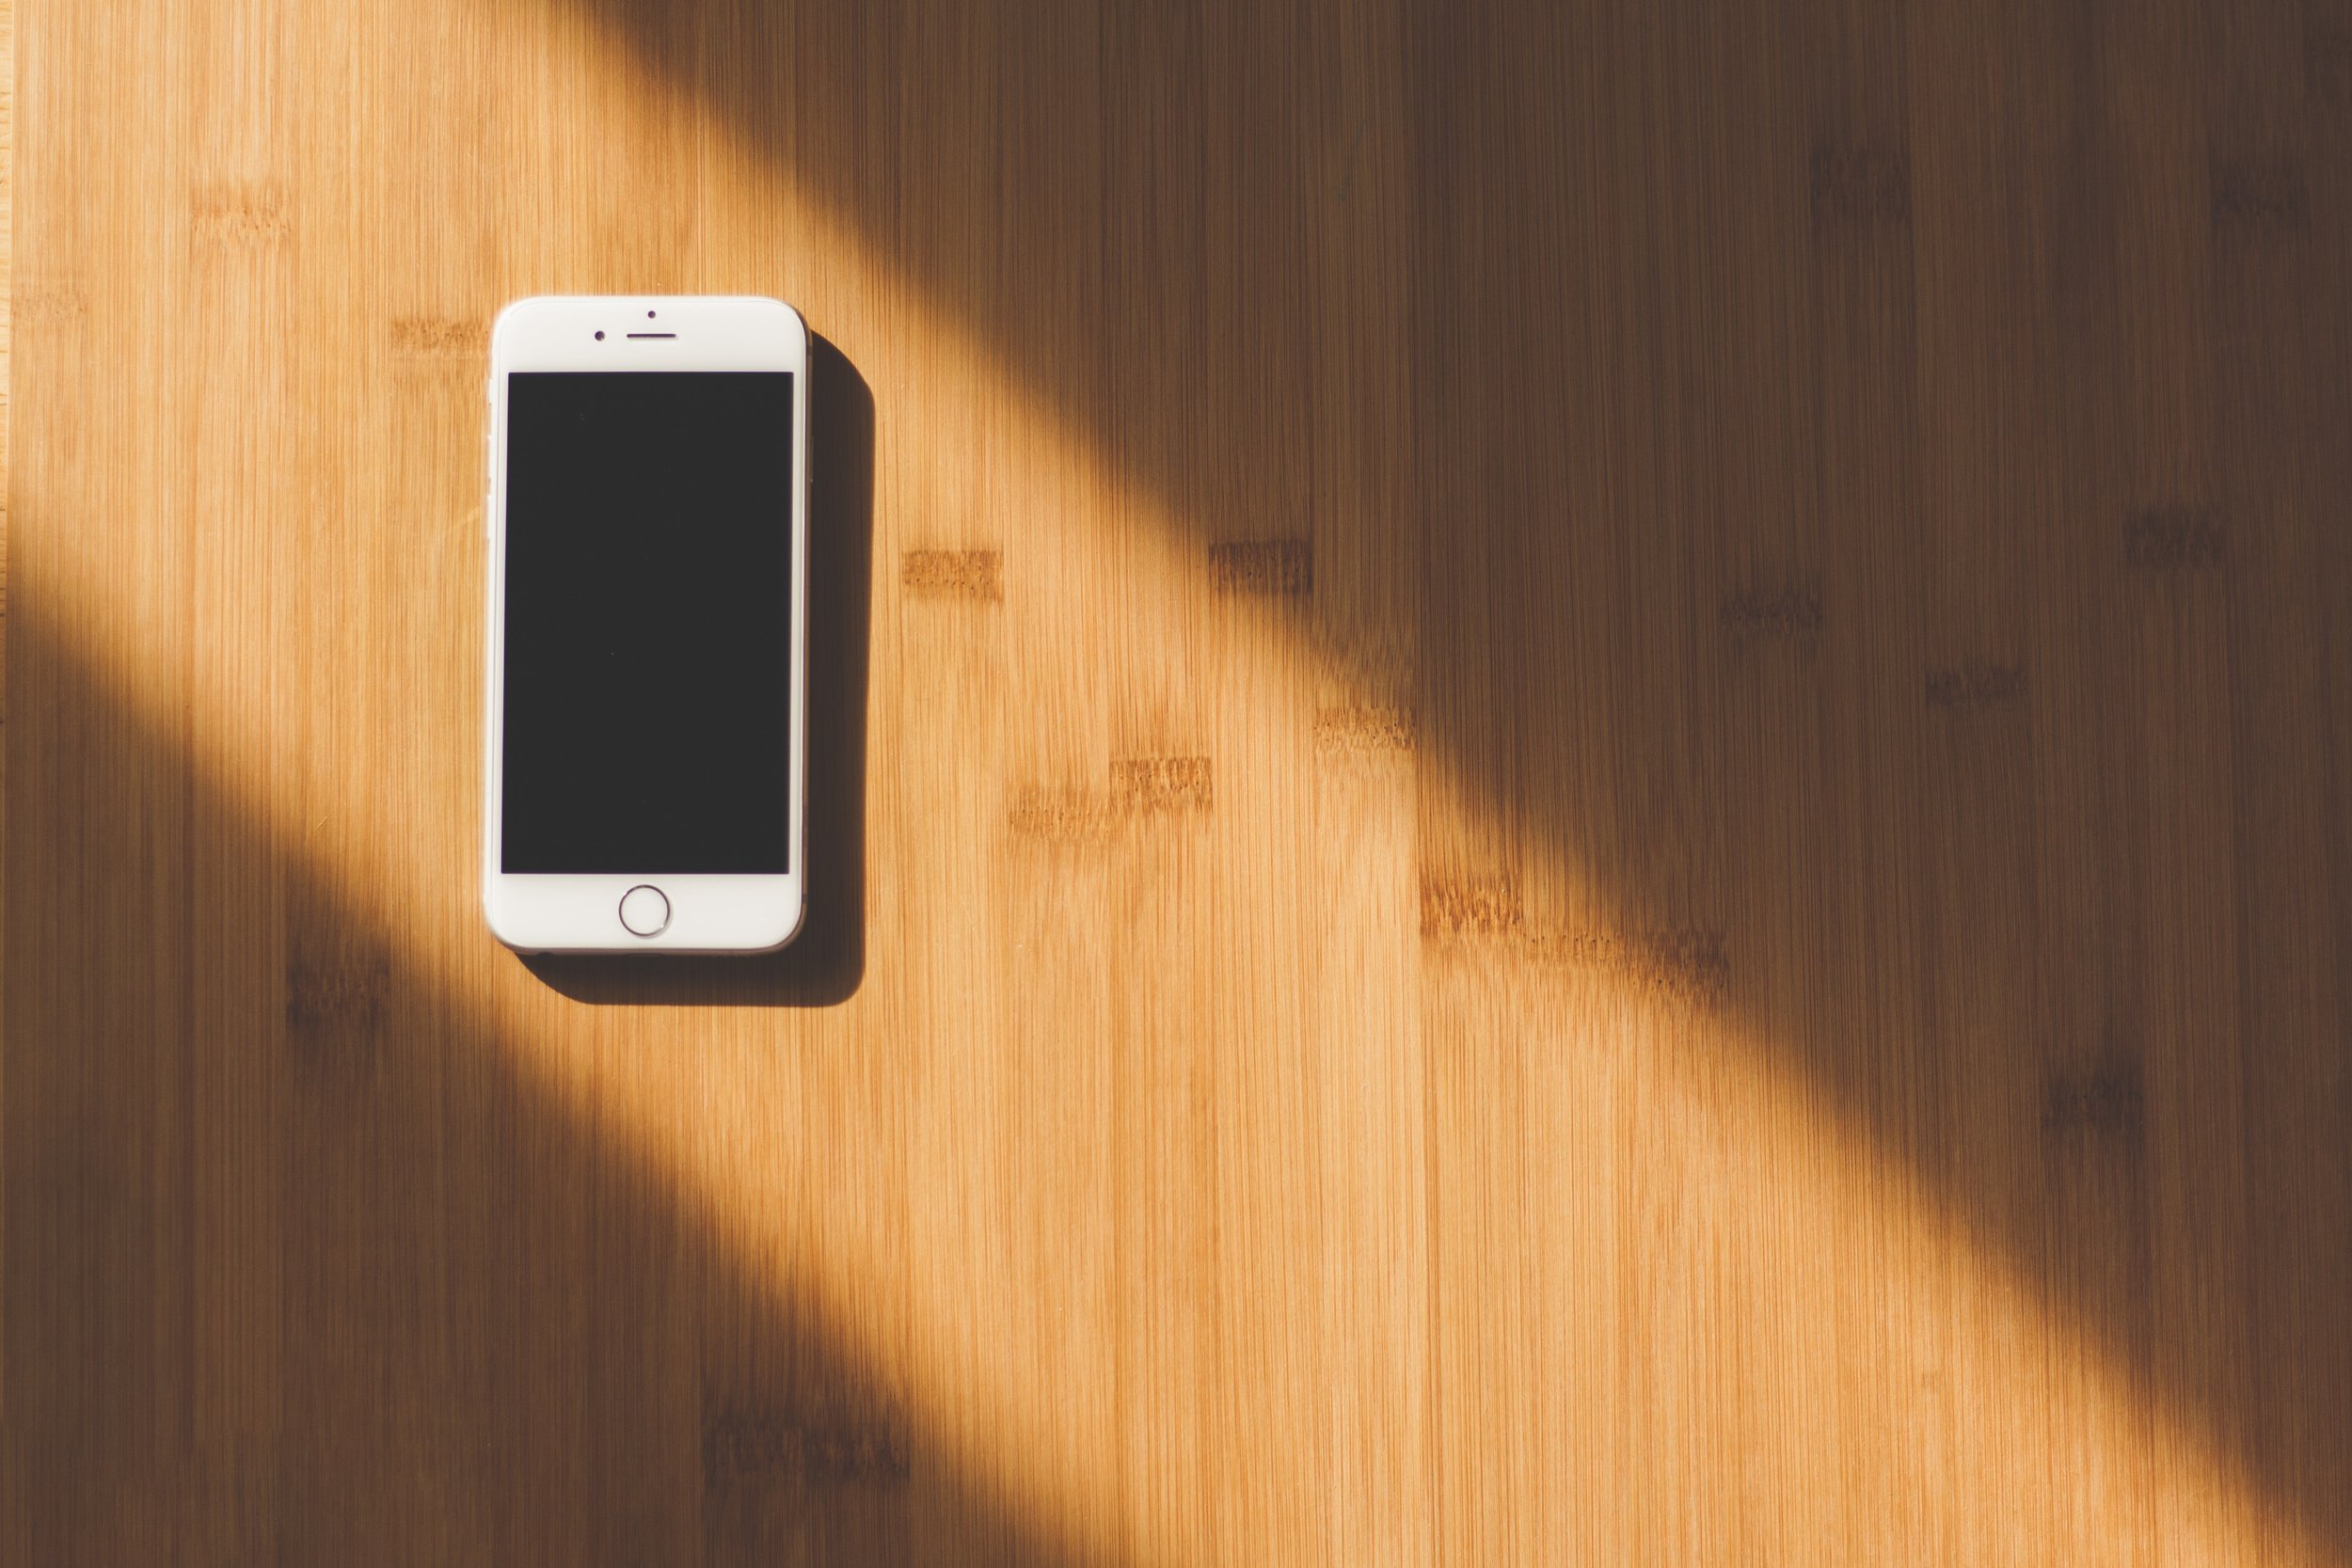 iphone-mobile-phone-48605.jpg